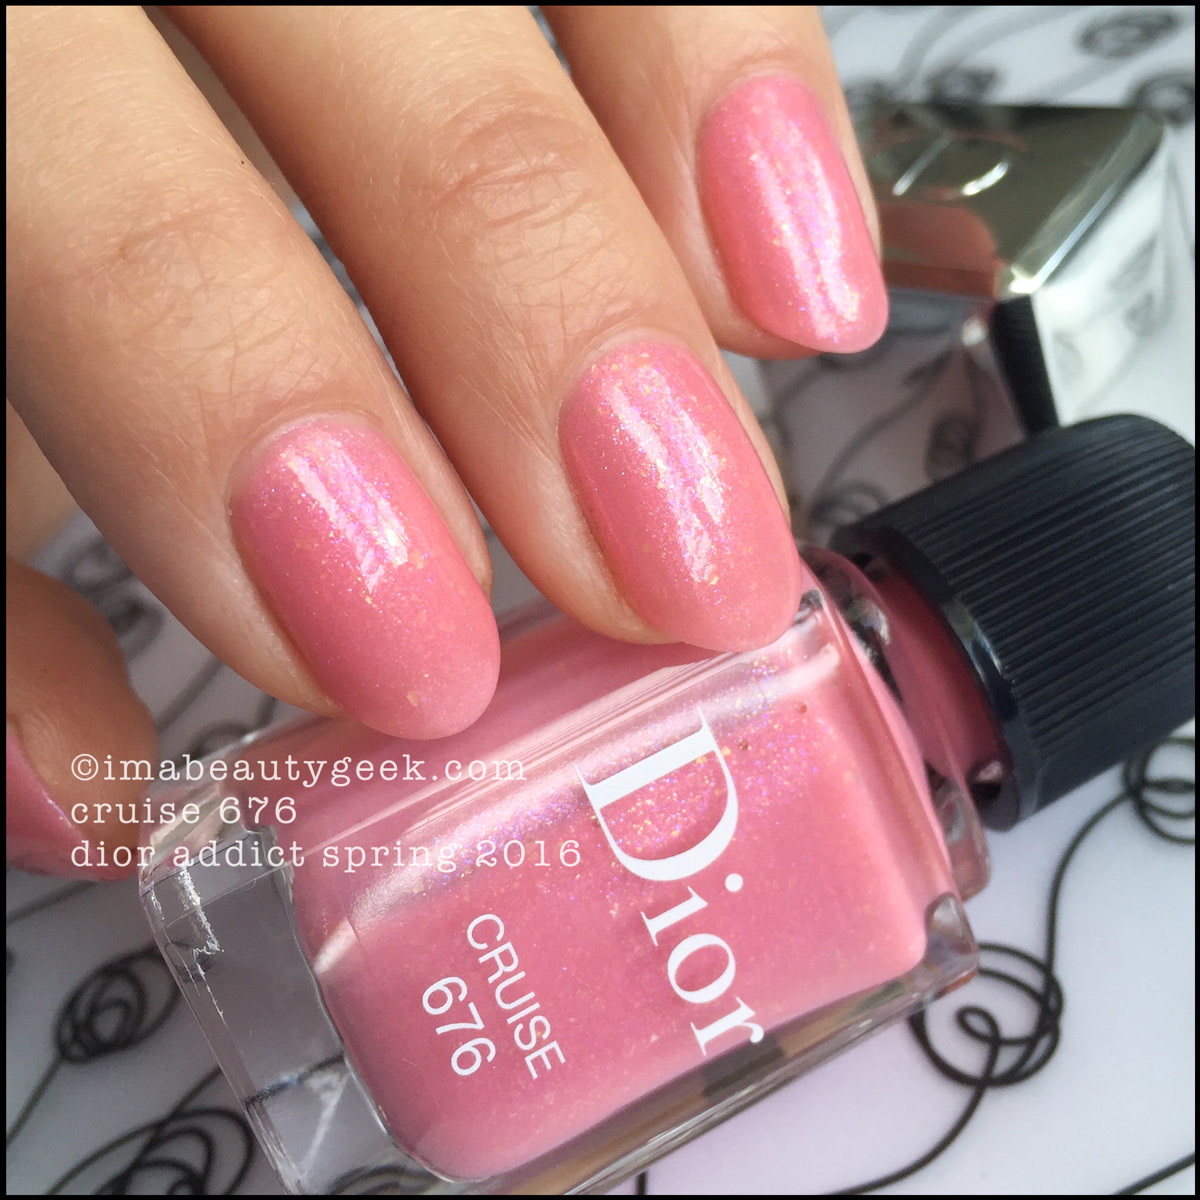 Dior Vernis Cruise 676_Dior Addict Nail Vernis Spring 2016